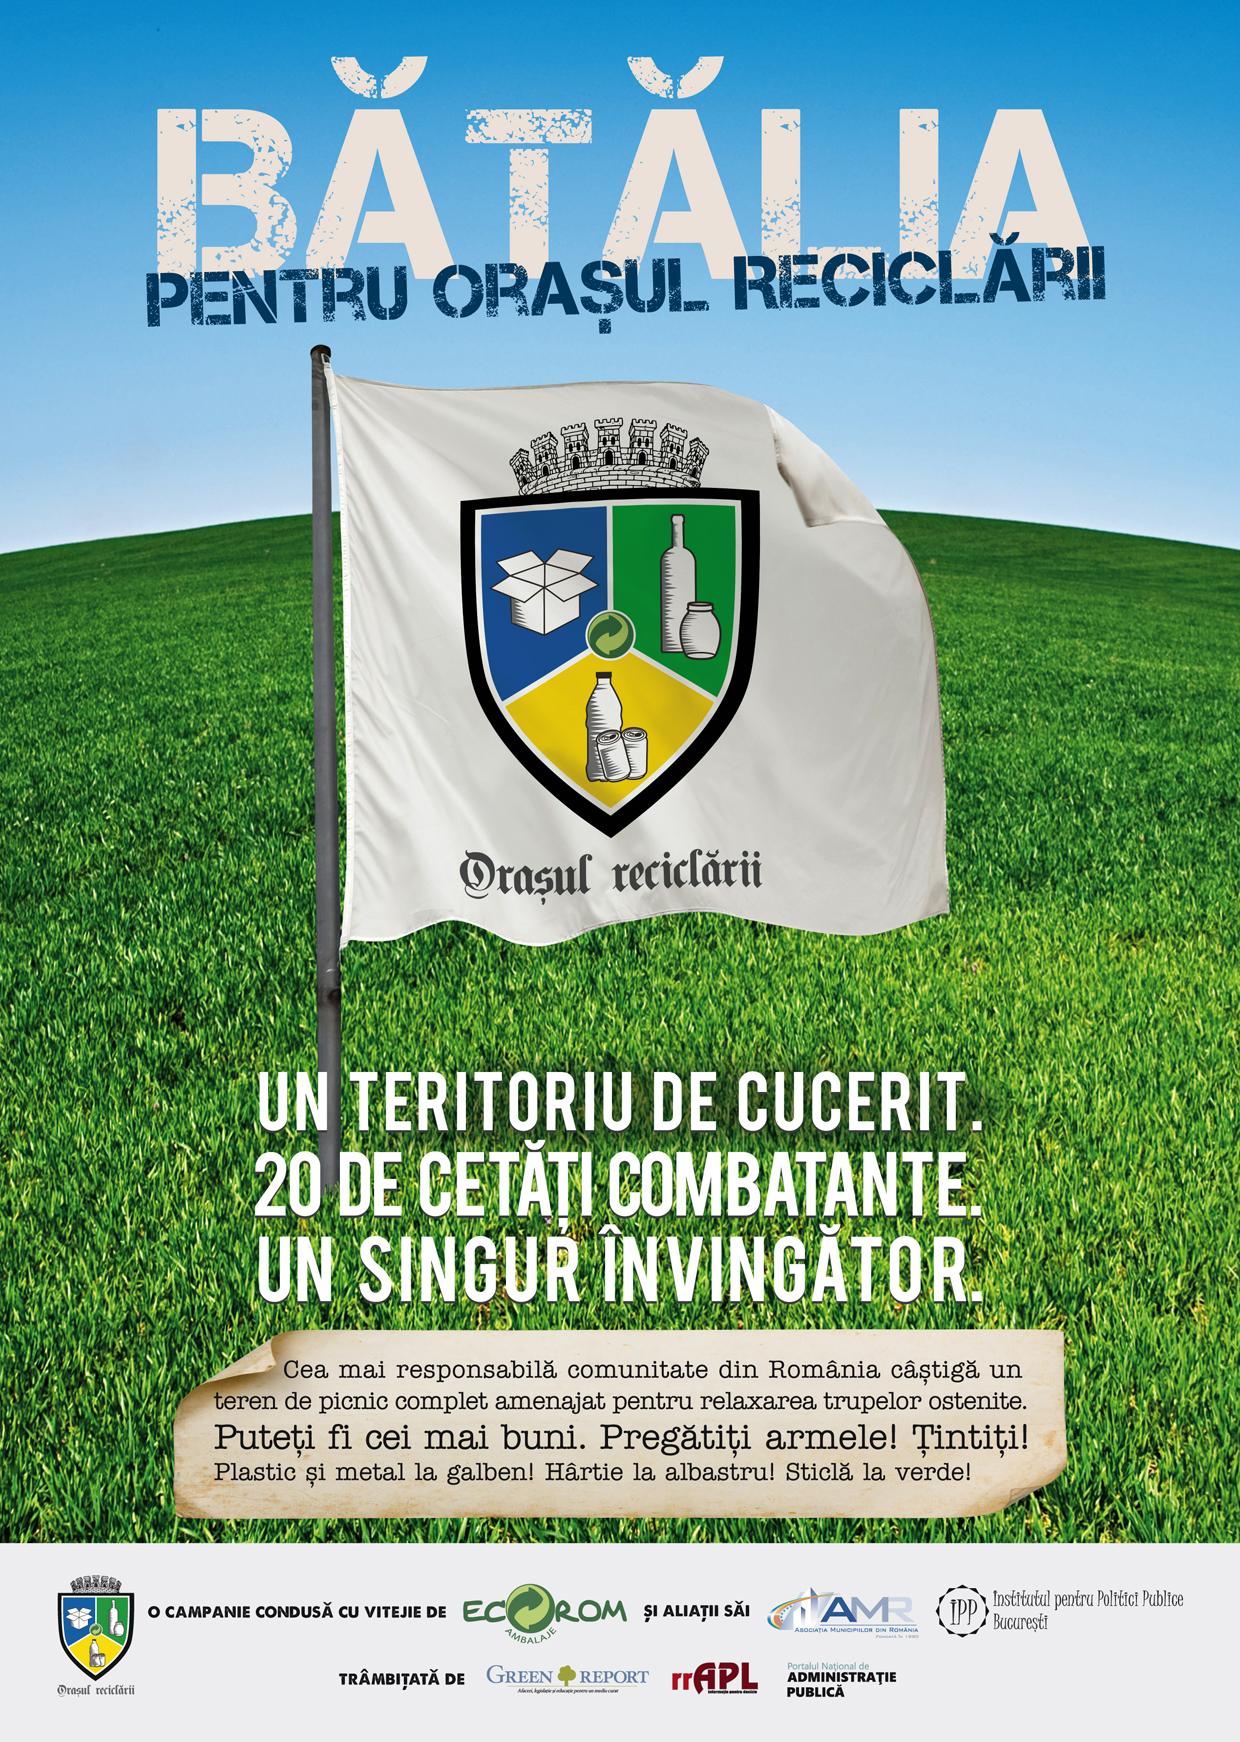 ECR 05 poster orasul reciclarii 420 X 594 mm 5 mm bleed